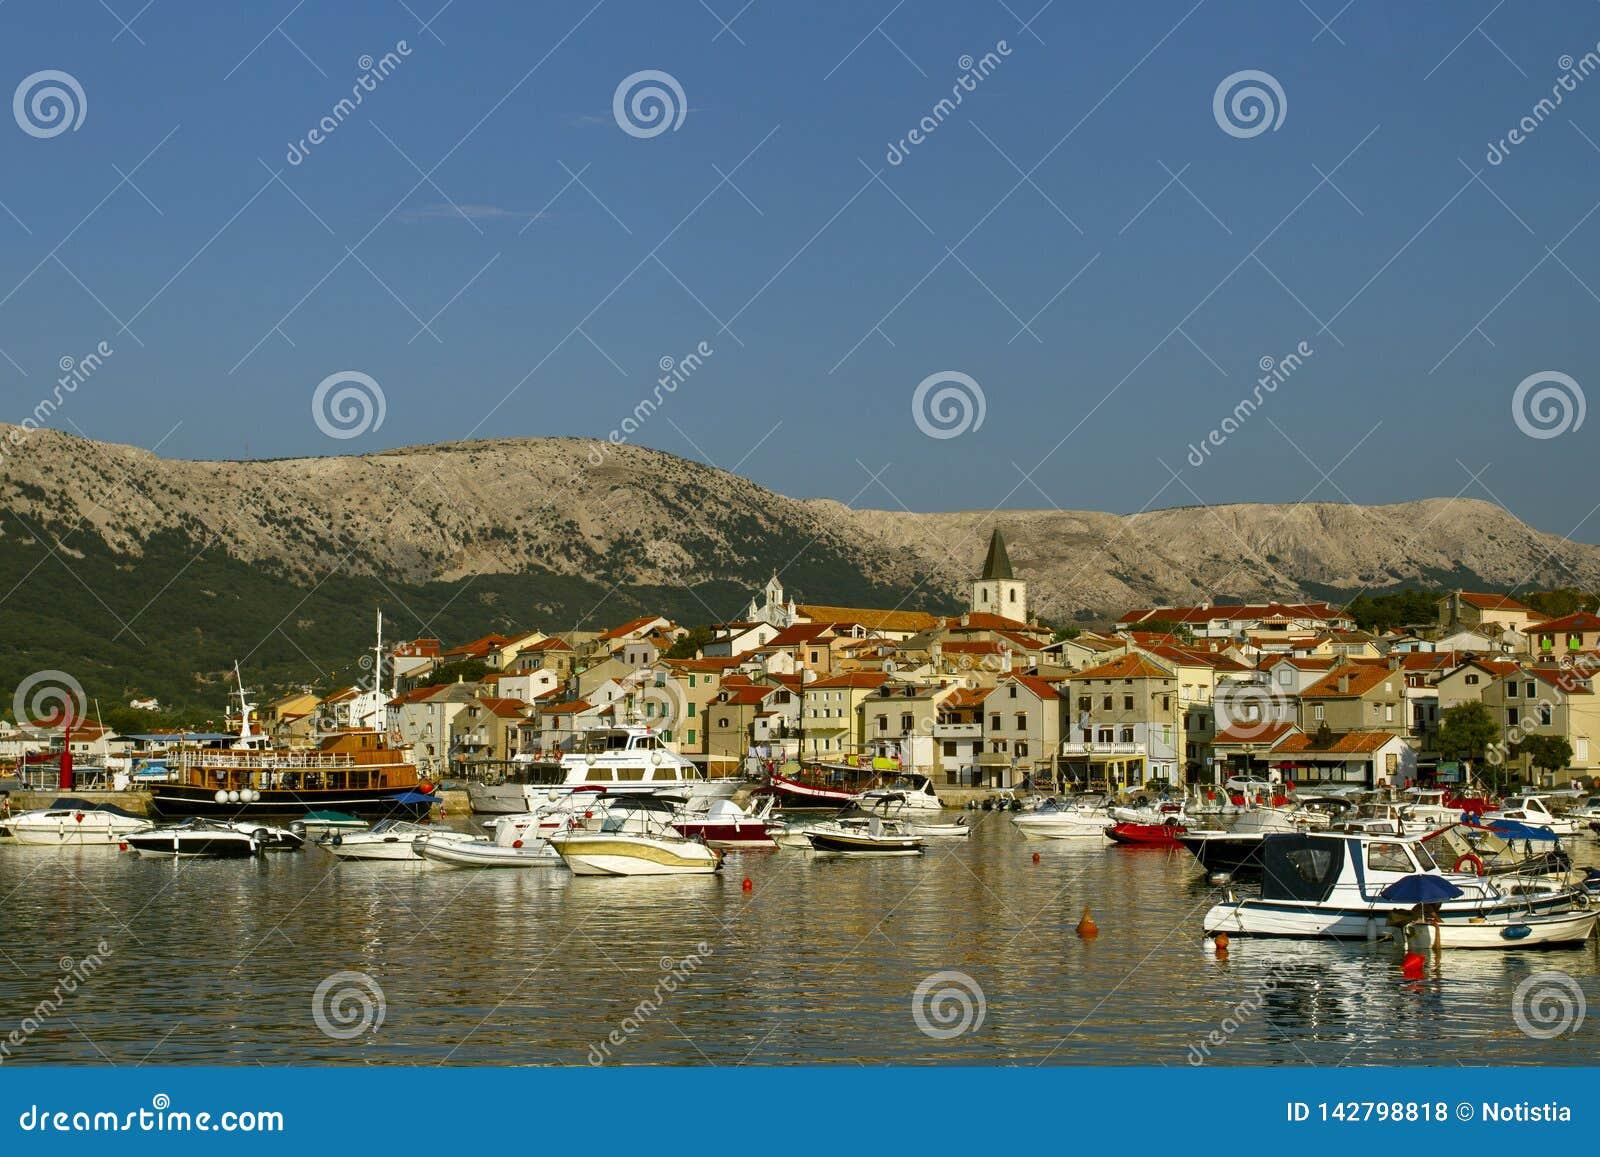 Small town of Baska its marina . Boat on foreground . Croatia vacation. Island Krk. Adriatic coast, Croatia, Europe. Summer vaca